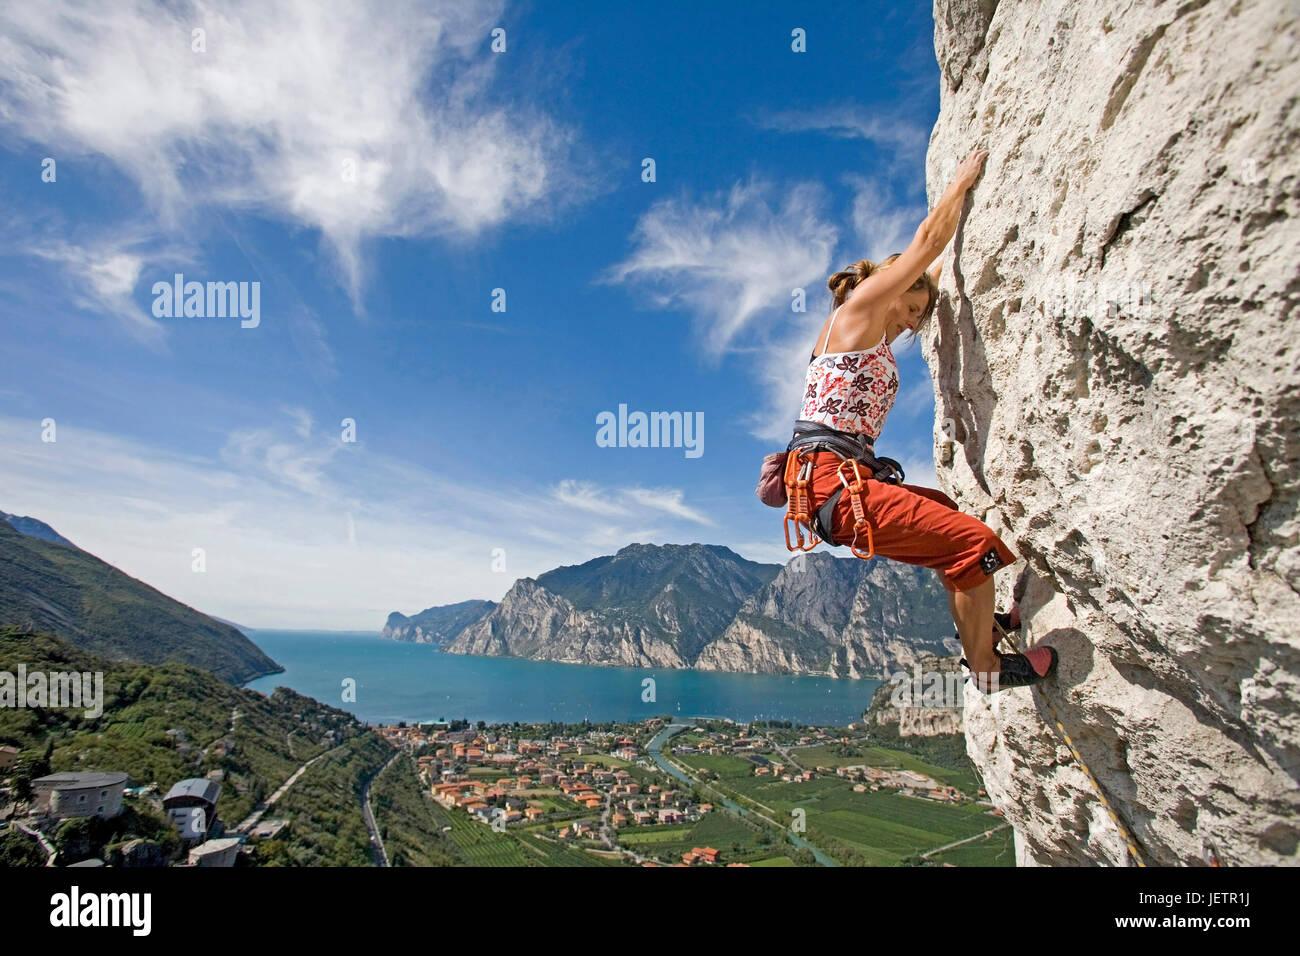 Climbing in the mountain - Free climb, Klettern am Berg - Free climb - Stock Image